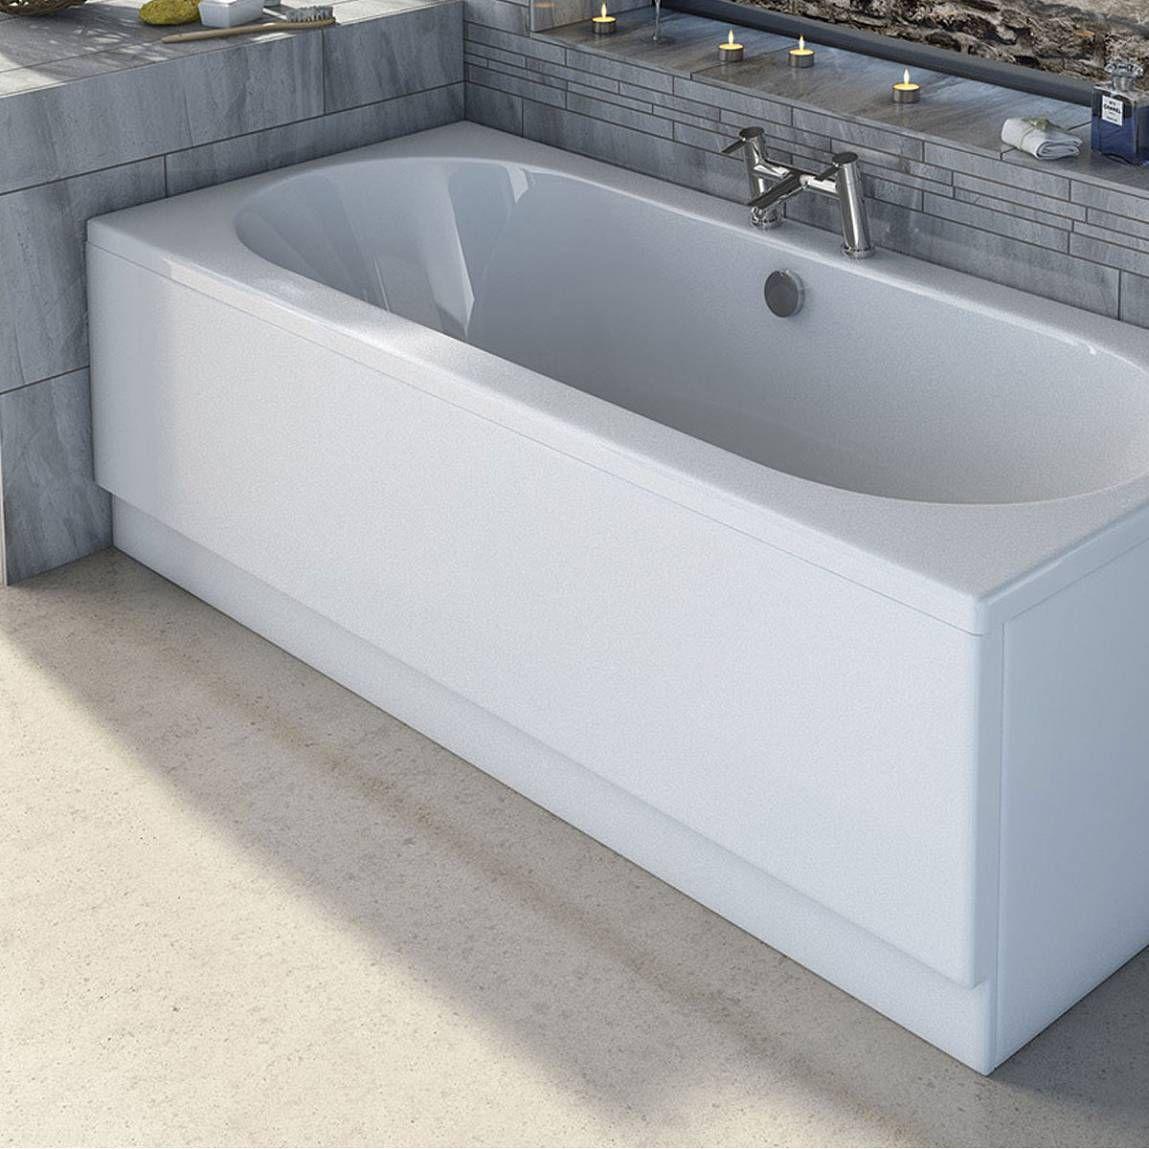 Acrylic Bath Side Panel 1500 Only £25.99 | Bathtub Side Panel ...